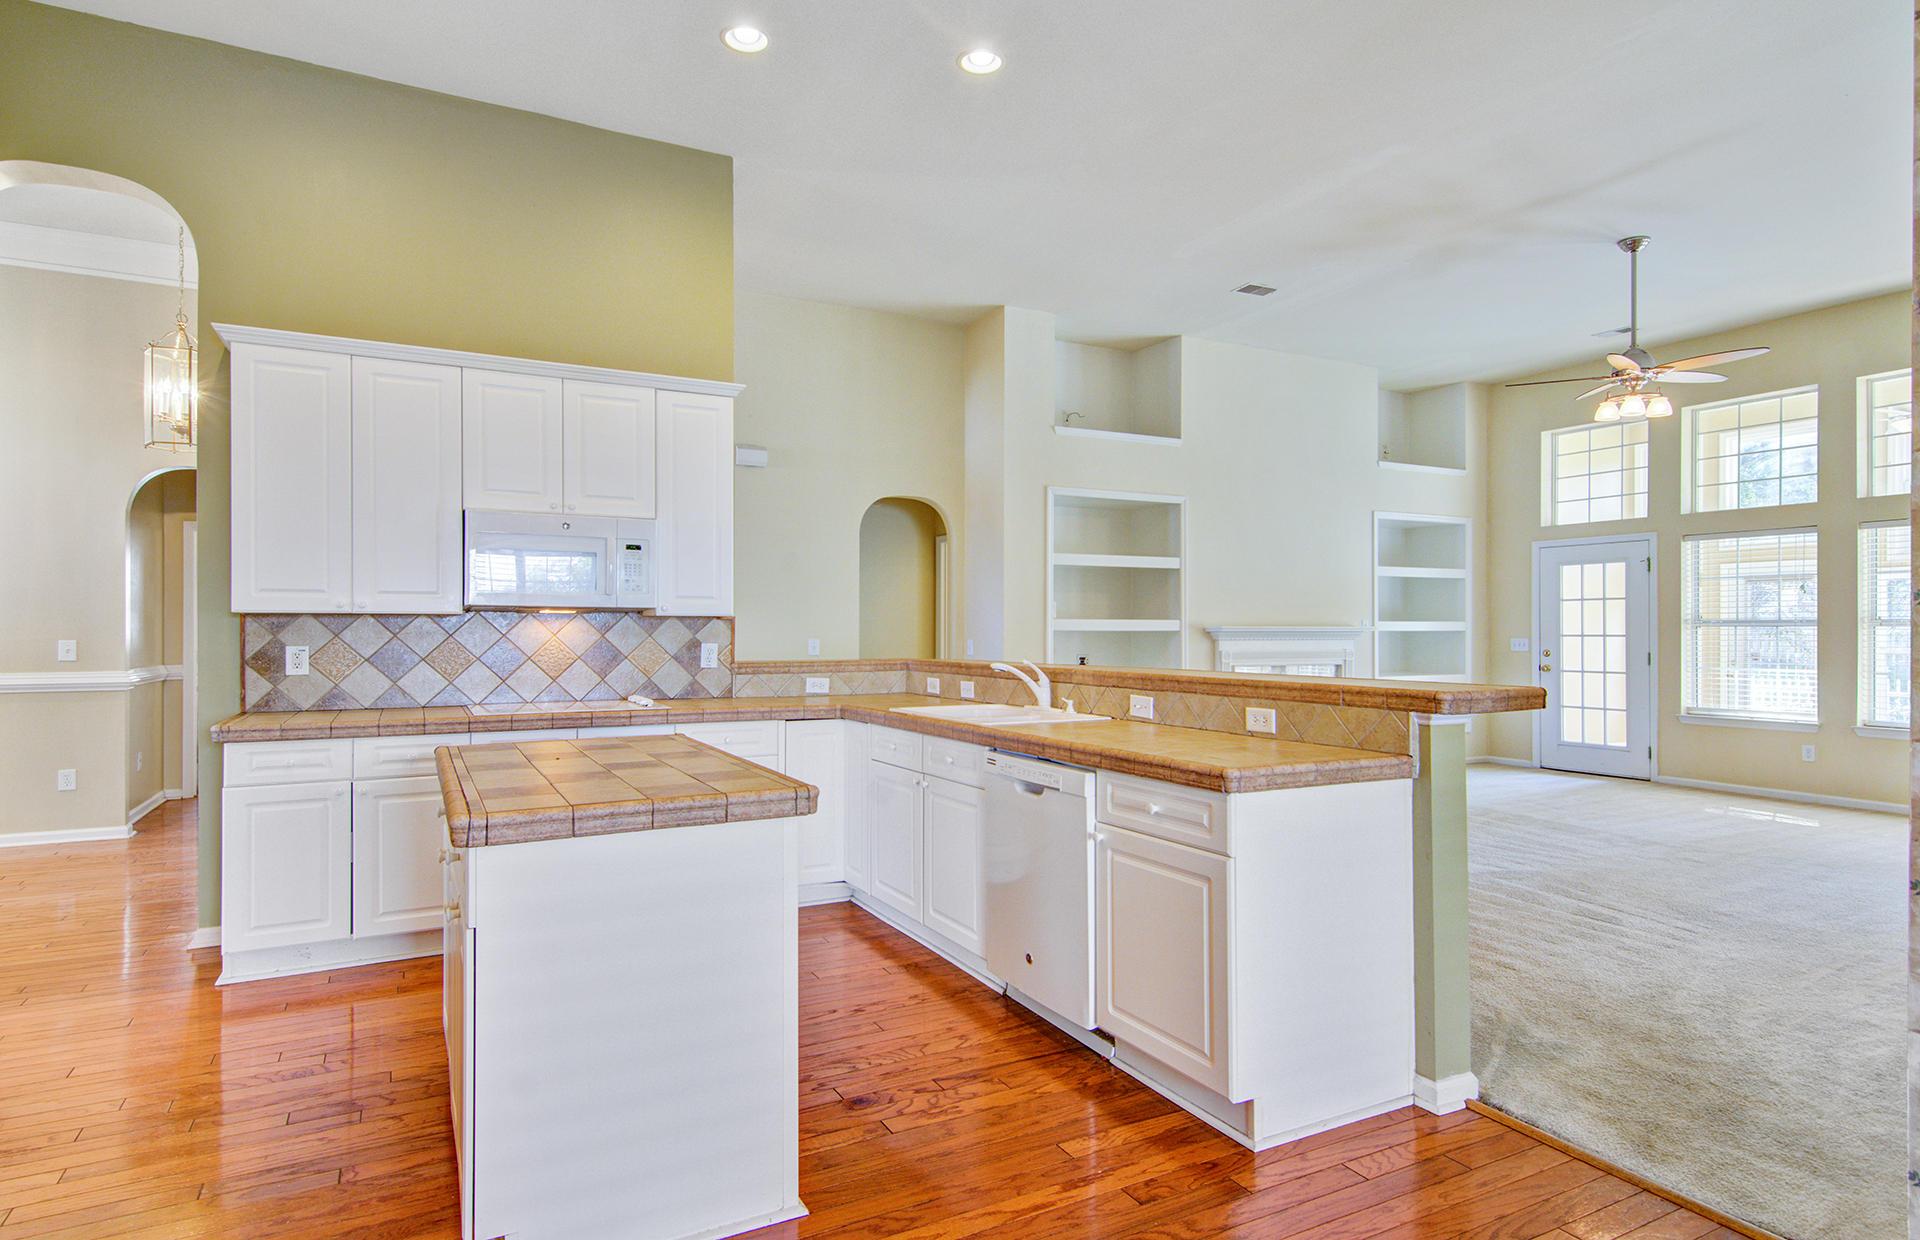 Grand Oaks Plantation Homes For Sale - 1013 Tyron, Charleston, SC - 15